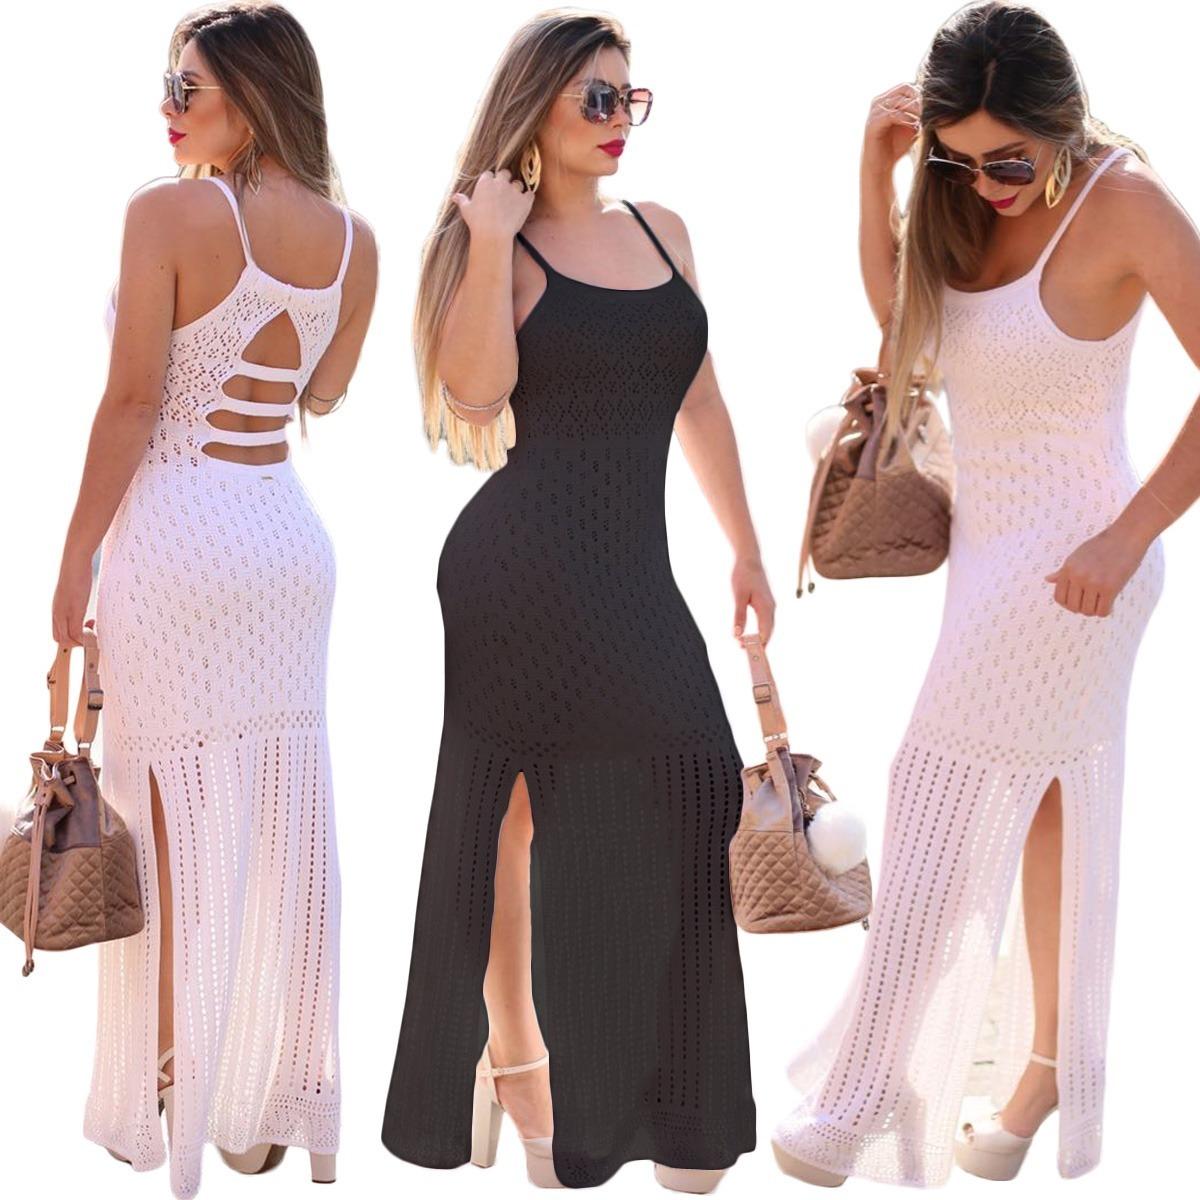 b00e6b2f46 vestido longo festa feminino tricot rendado fendas pernas. Carregando zoom.